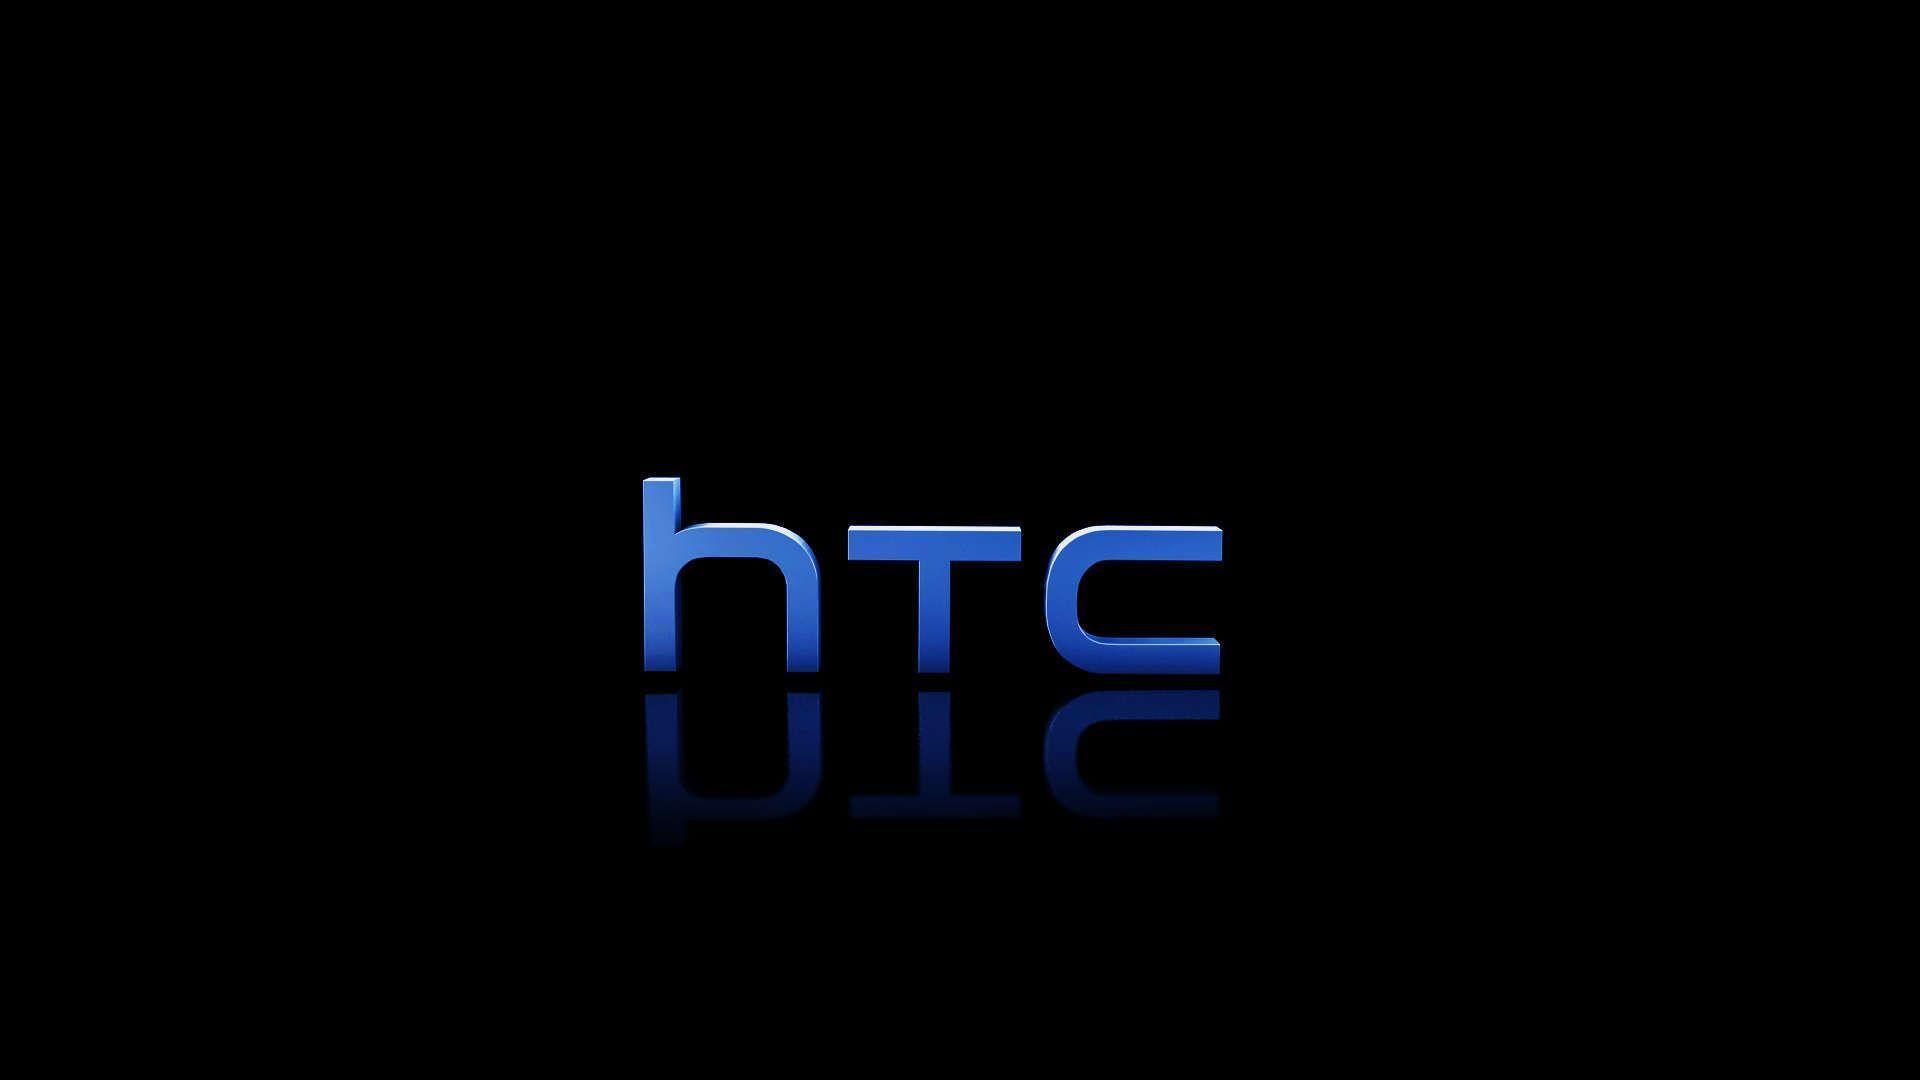 Best Wallpaper Logo Htc - wp2611756  Graphic_488548.jpg